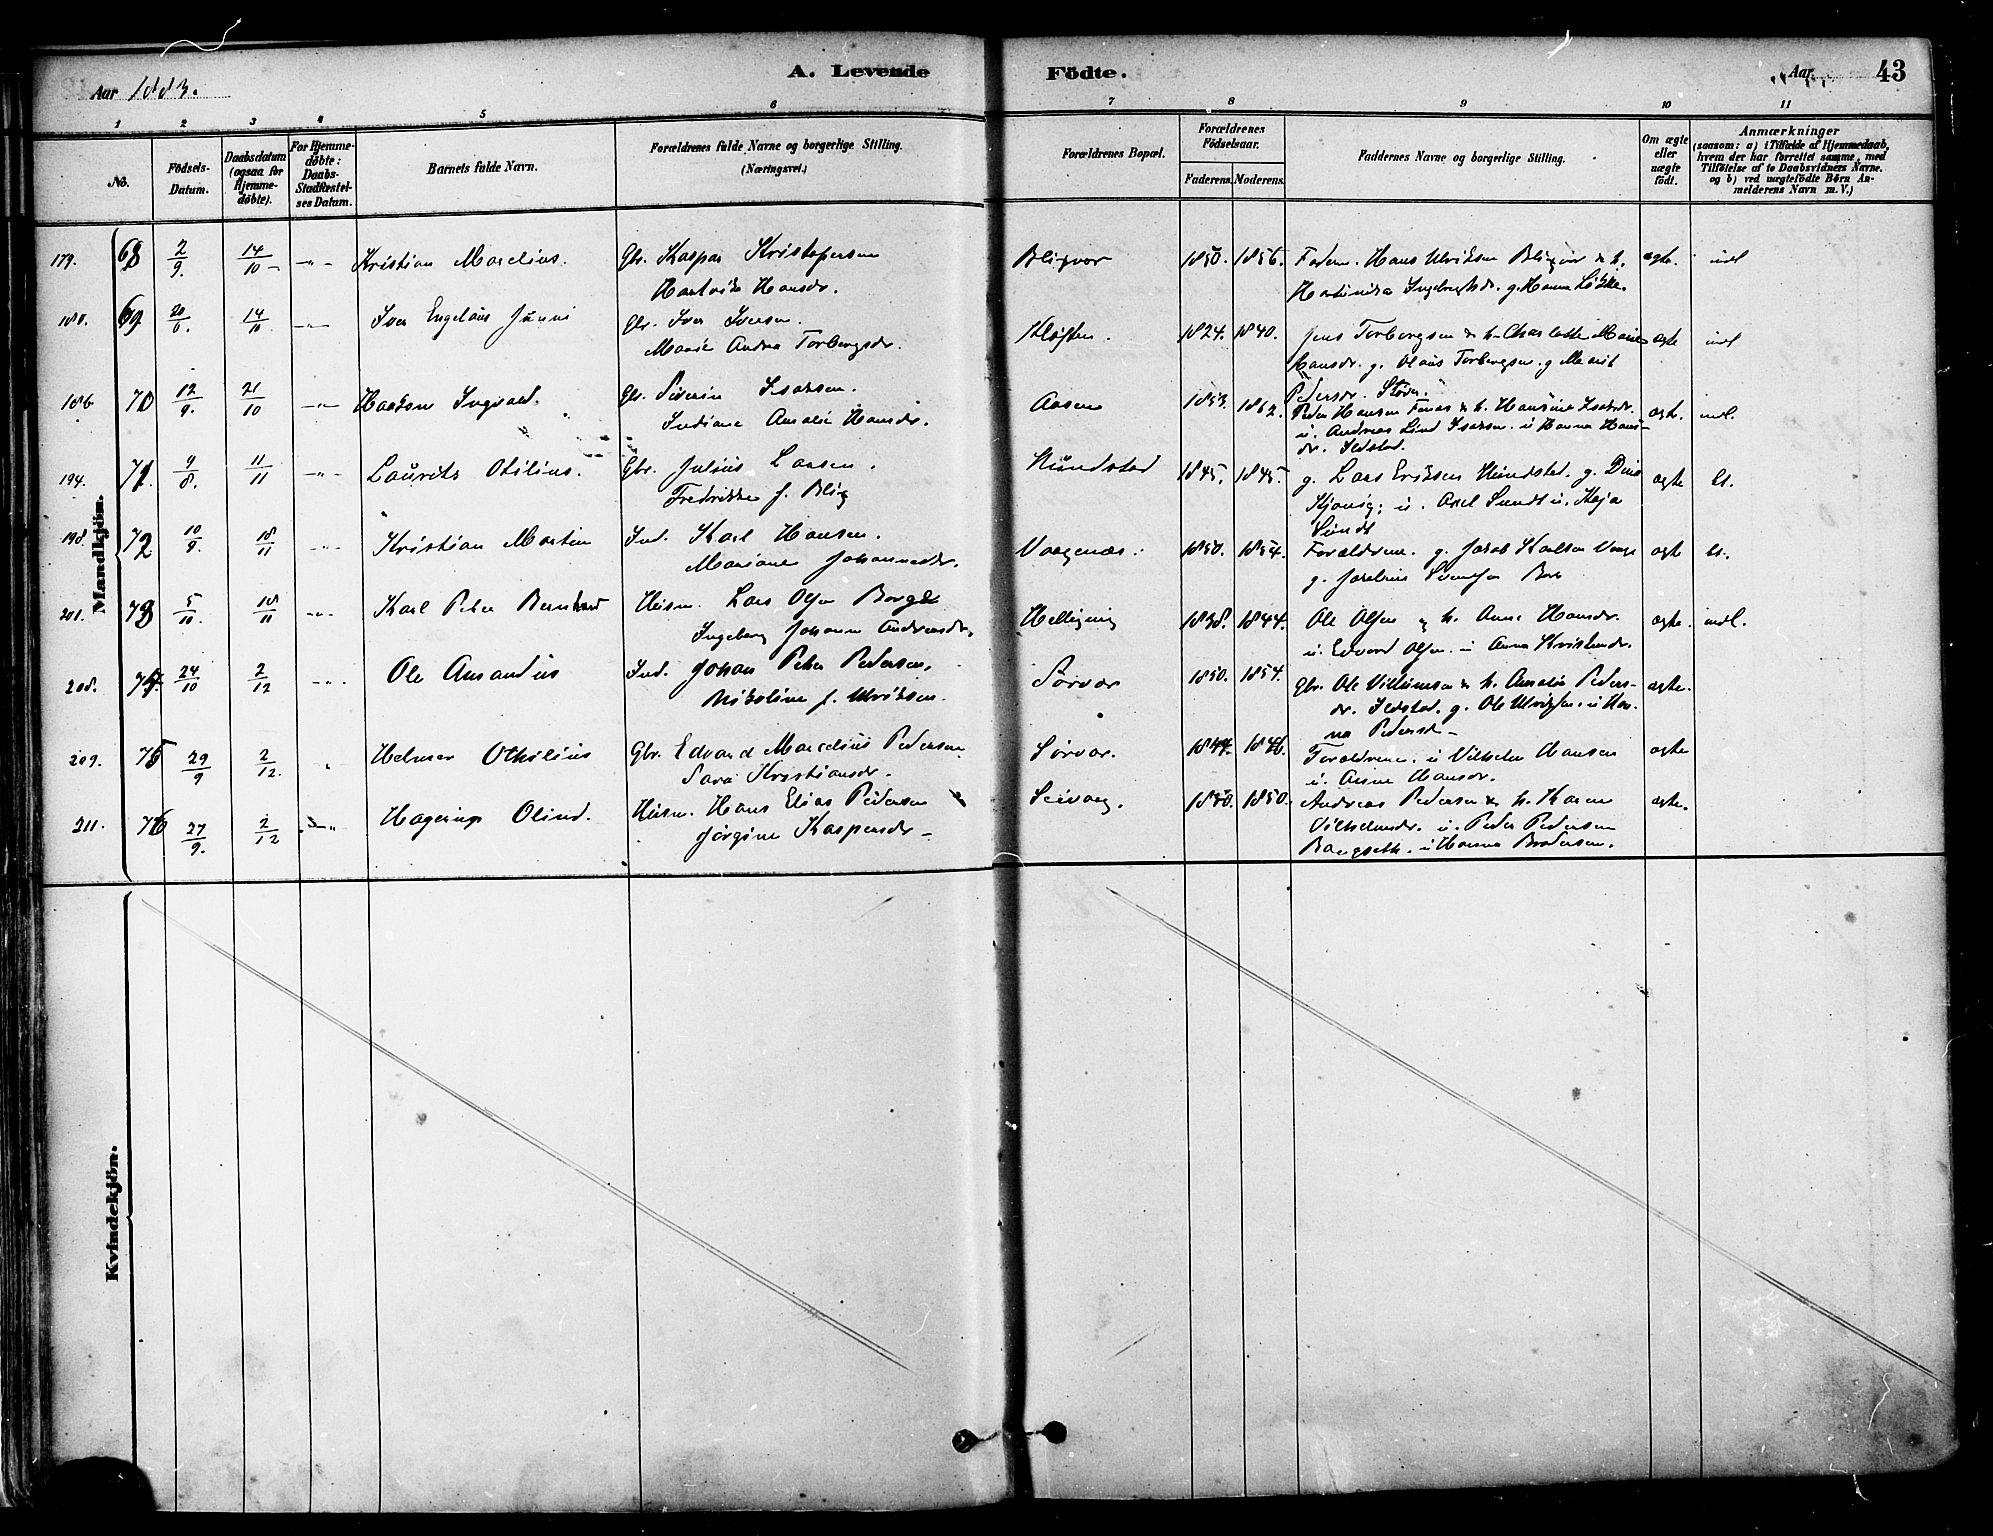 SAT, Ministerialprotokoller, klokkerbøker og fødselsregistre - Nordland, 802/L0054: Ministerialbok nr. 802A01, 1879-1893, s. 43